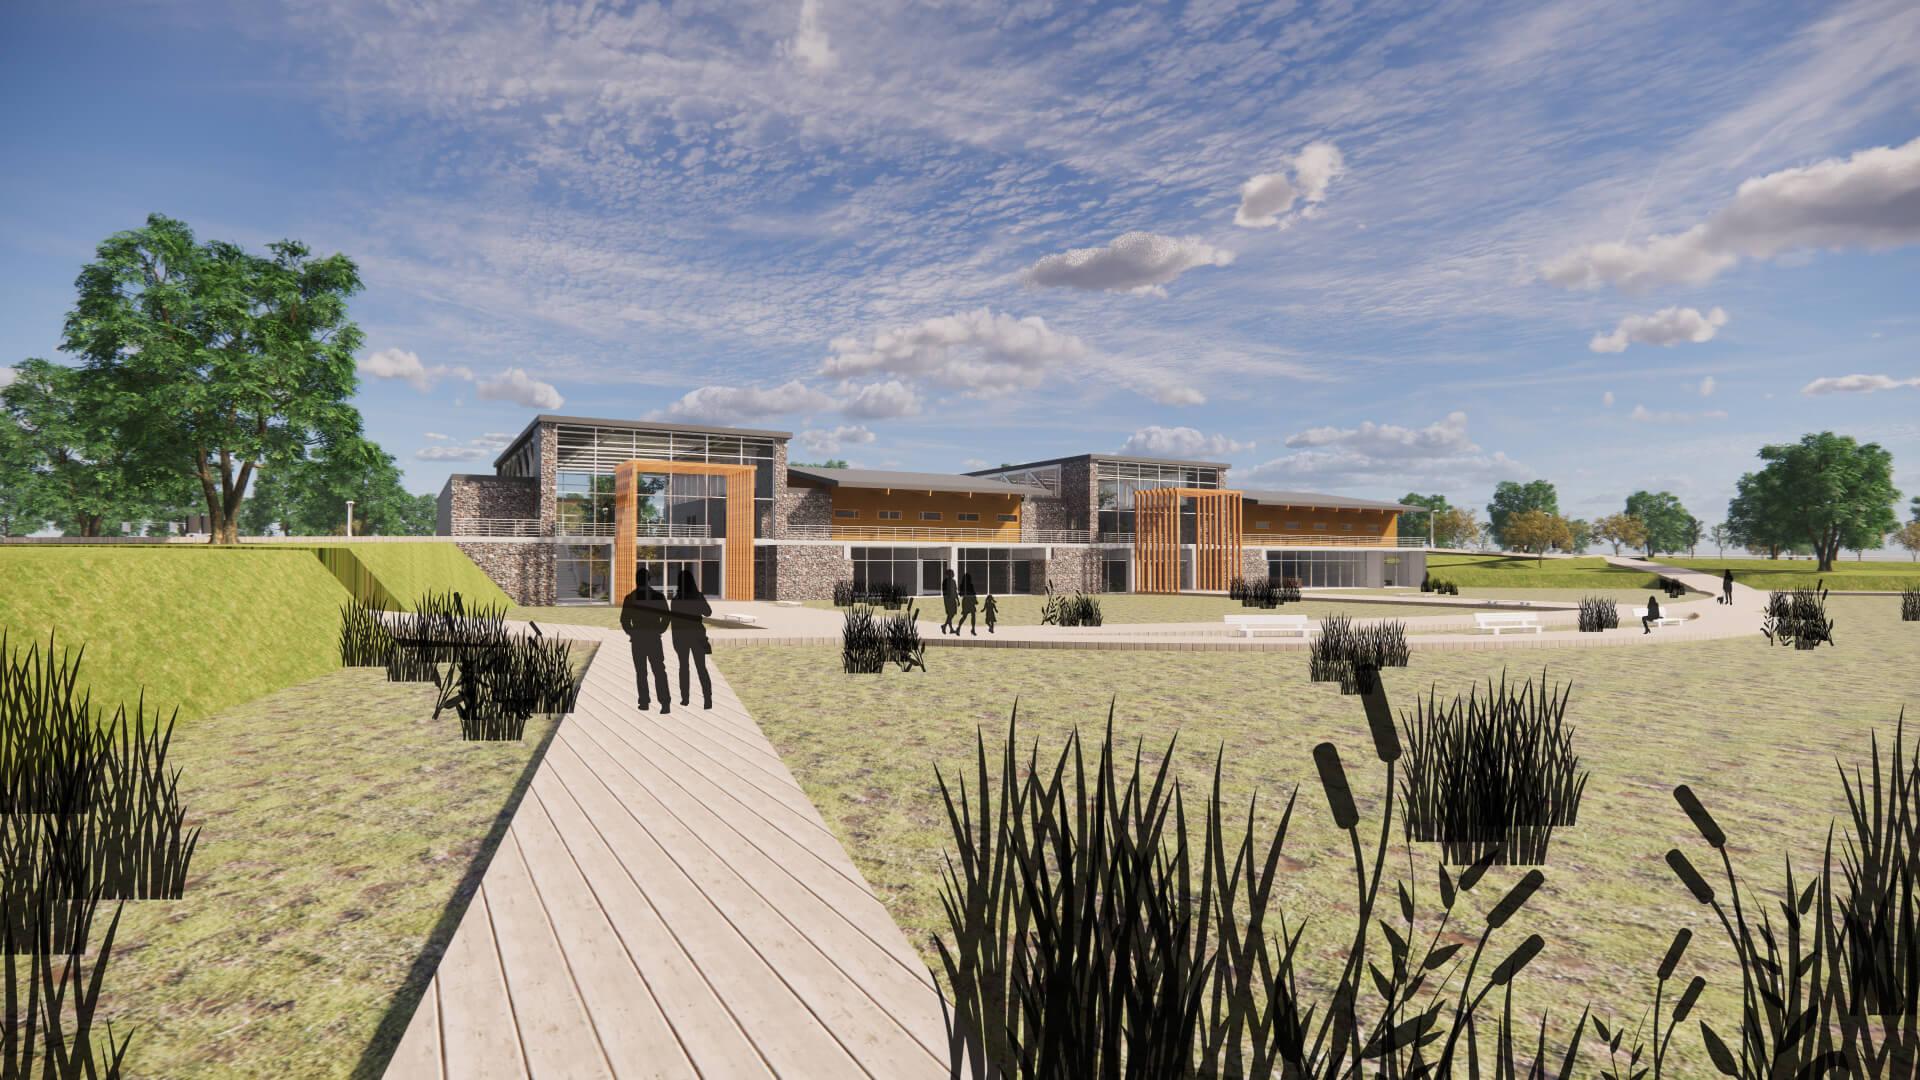 Lake Saint Clair Metropark Ecological Center